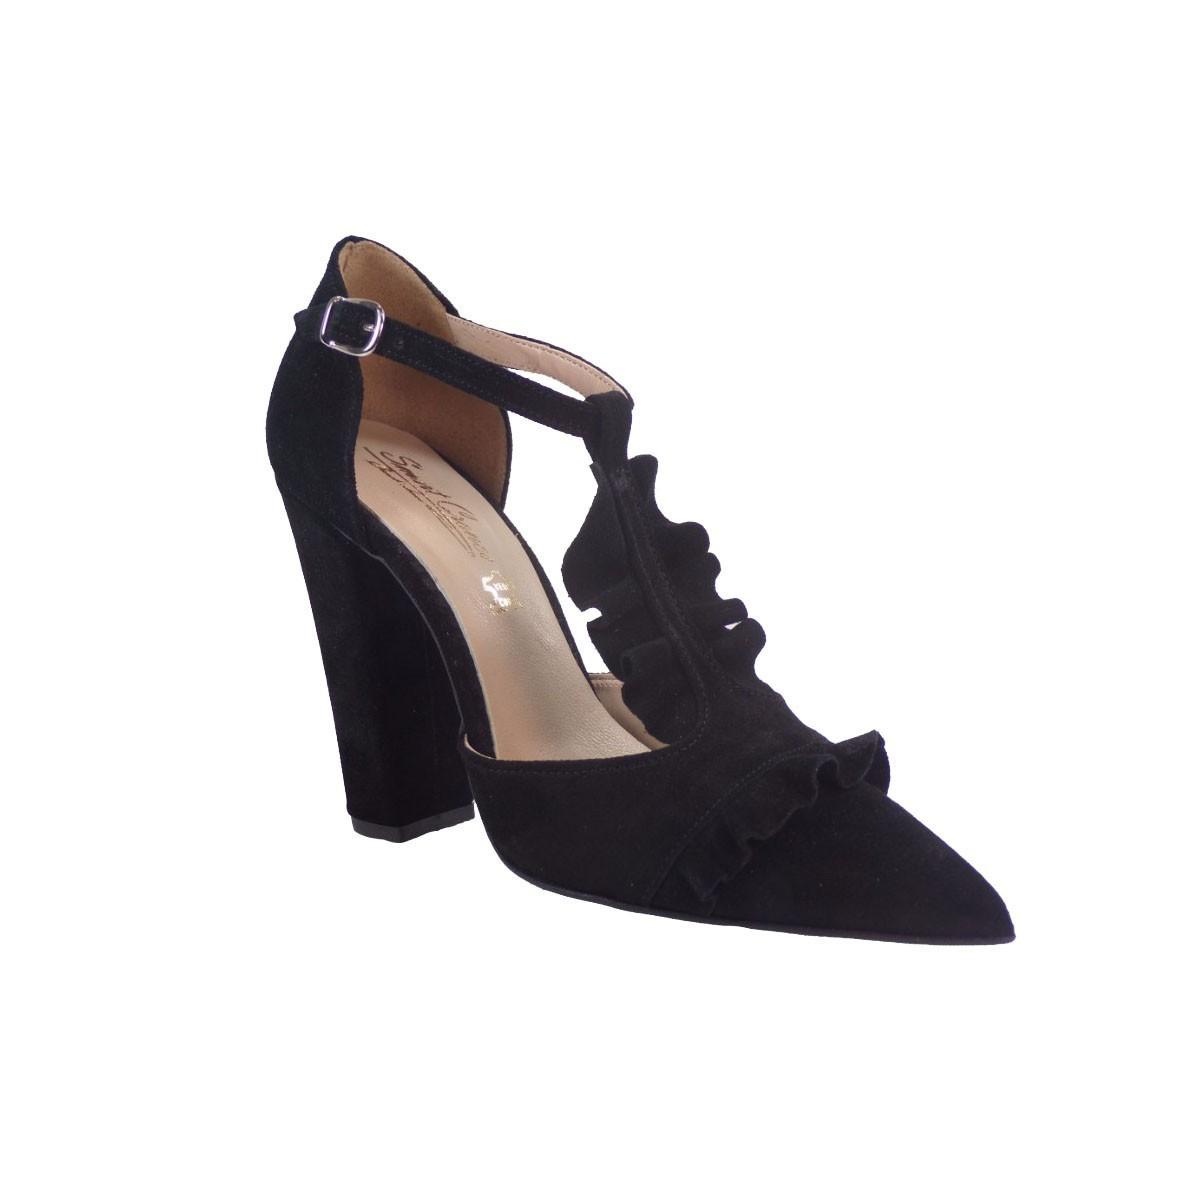 SMART CRONOS Γυναικεία Παπούτσια Γόβες 6709/1787 Μαύρο Δέρμα Καστόρι